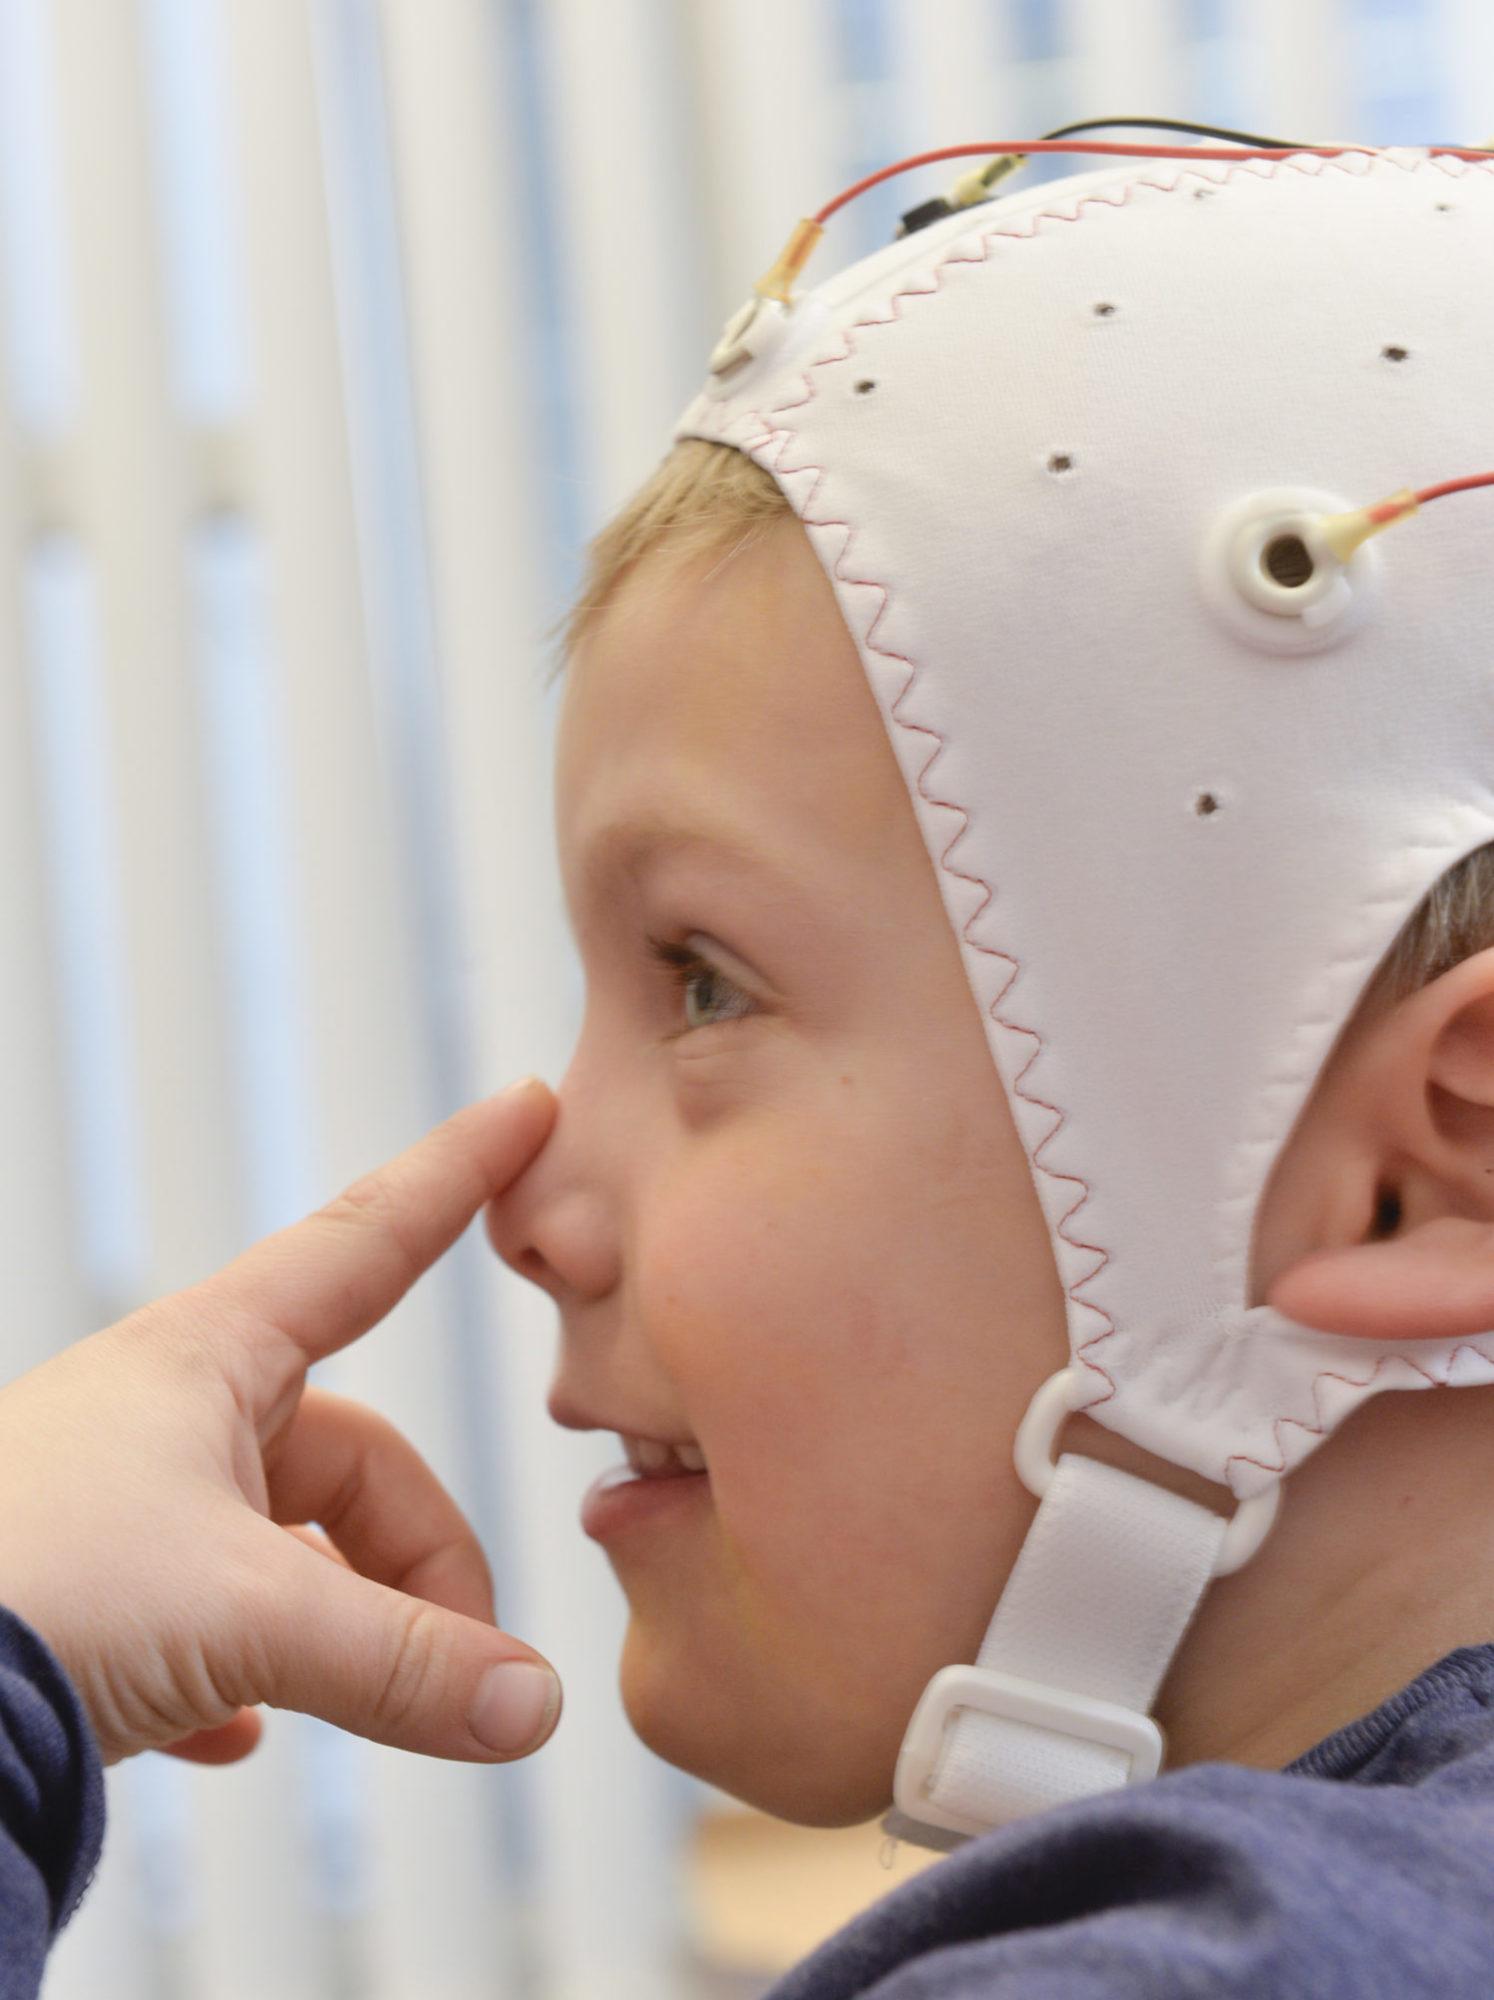 Junge verkabelt Gehirnströme